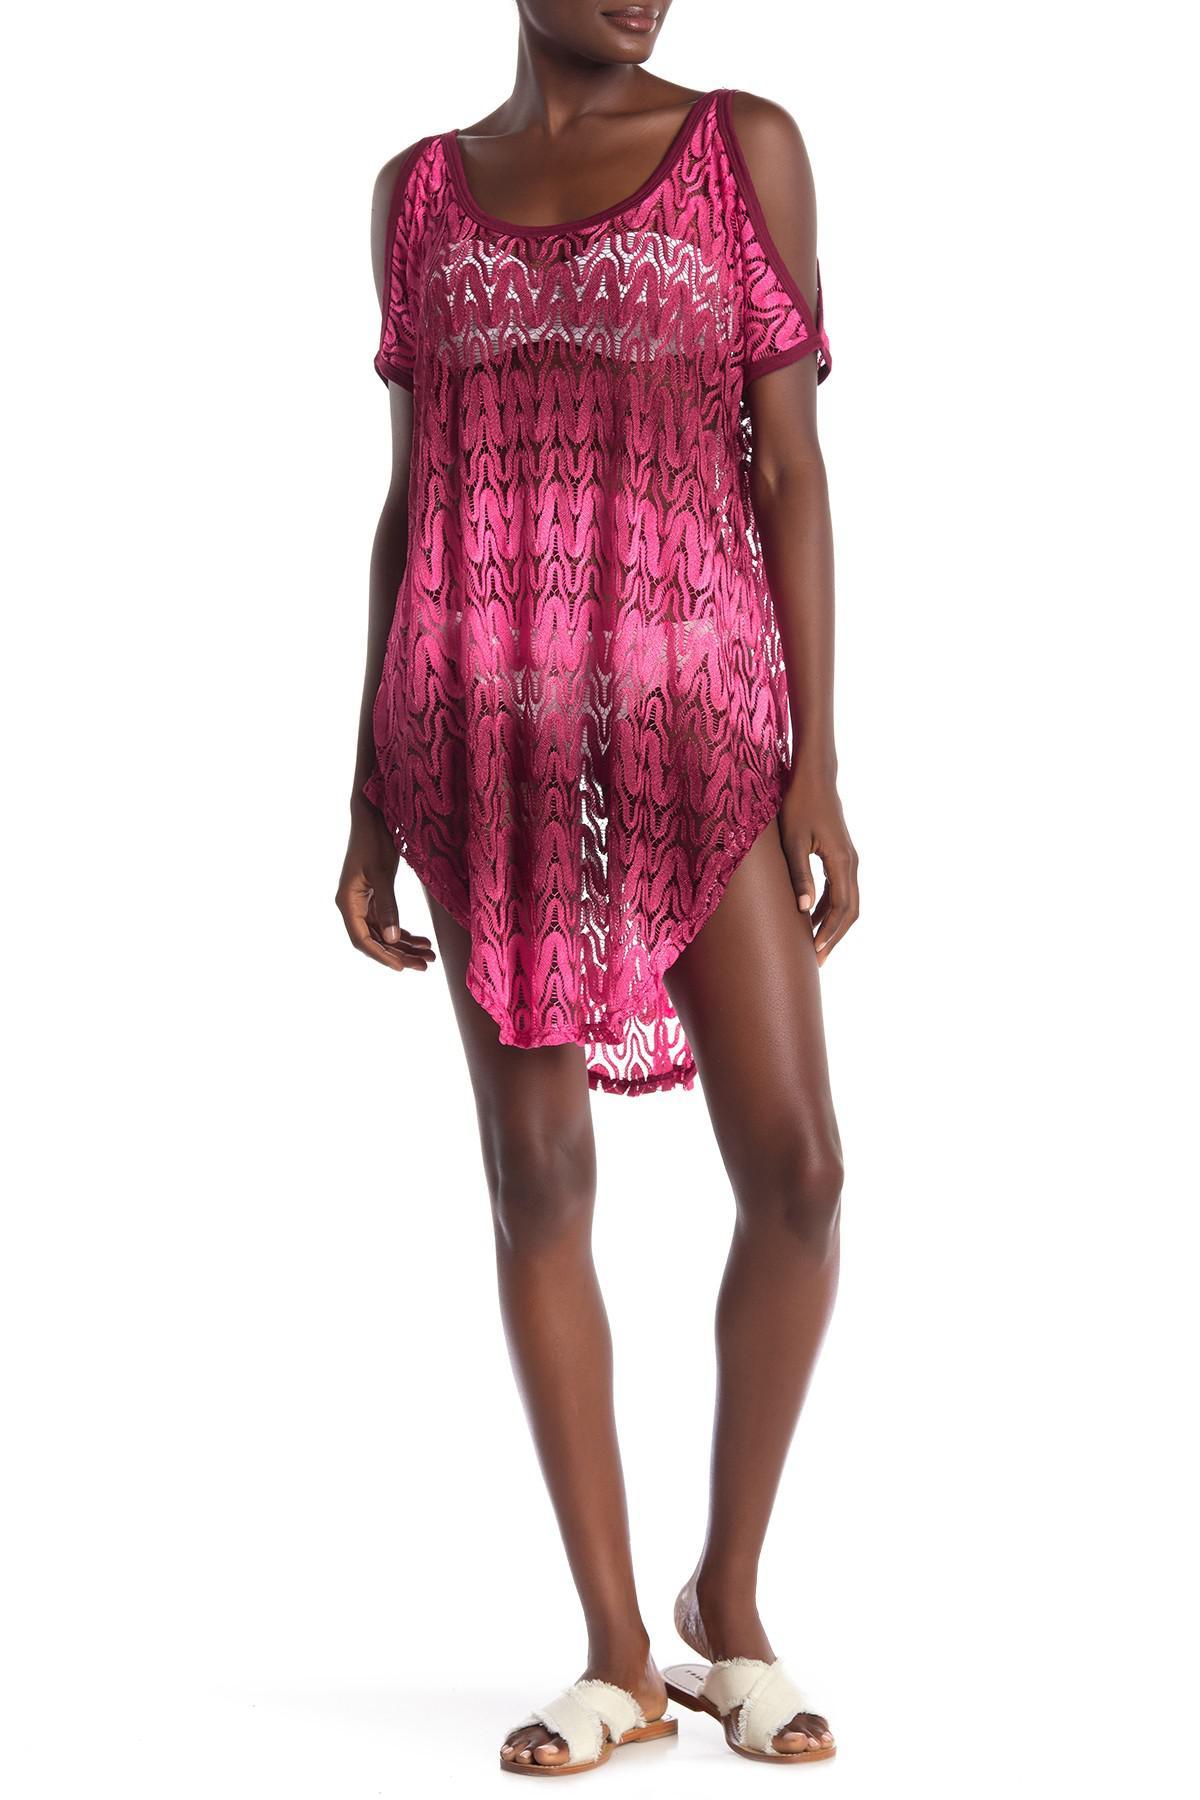 246179cb79069 Jordan Taylor. Women s Ombre Cold Shoulder Crochet Cover-up Tunic